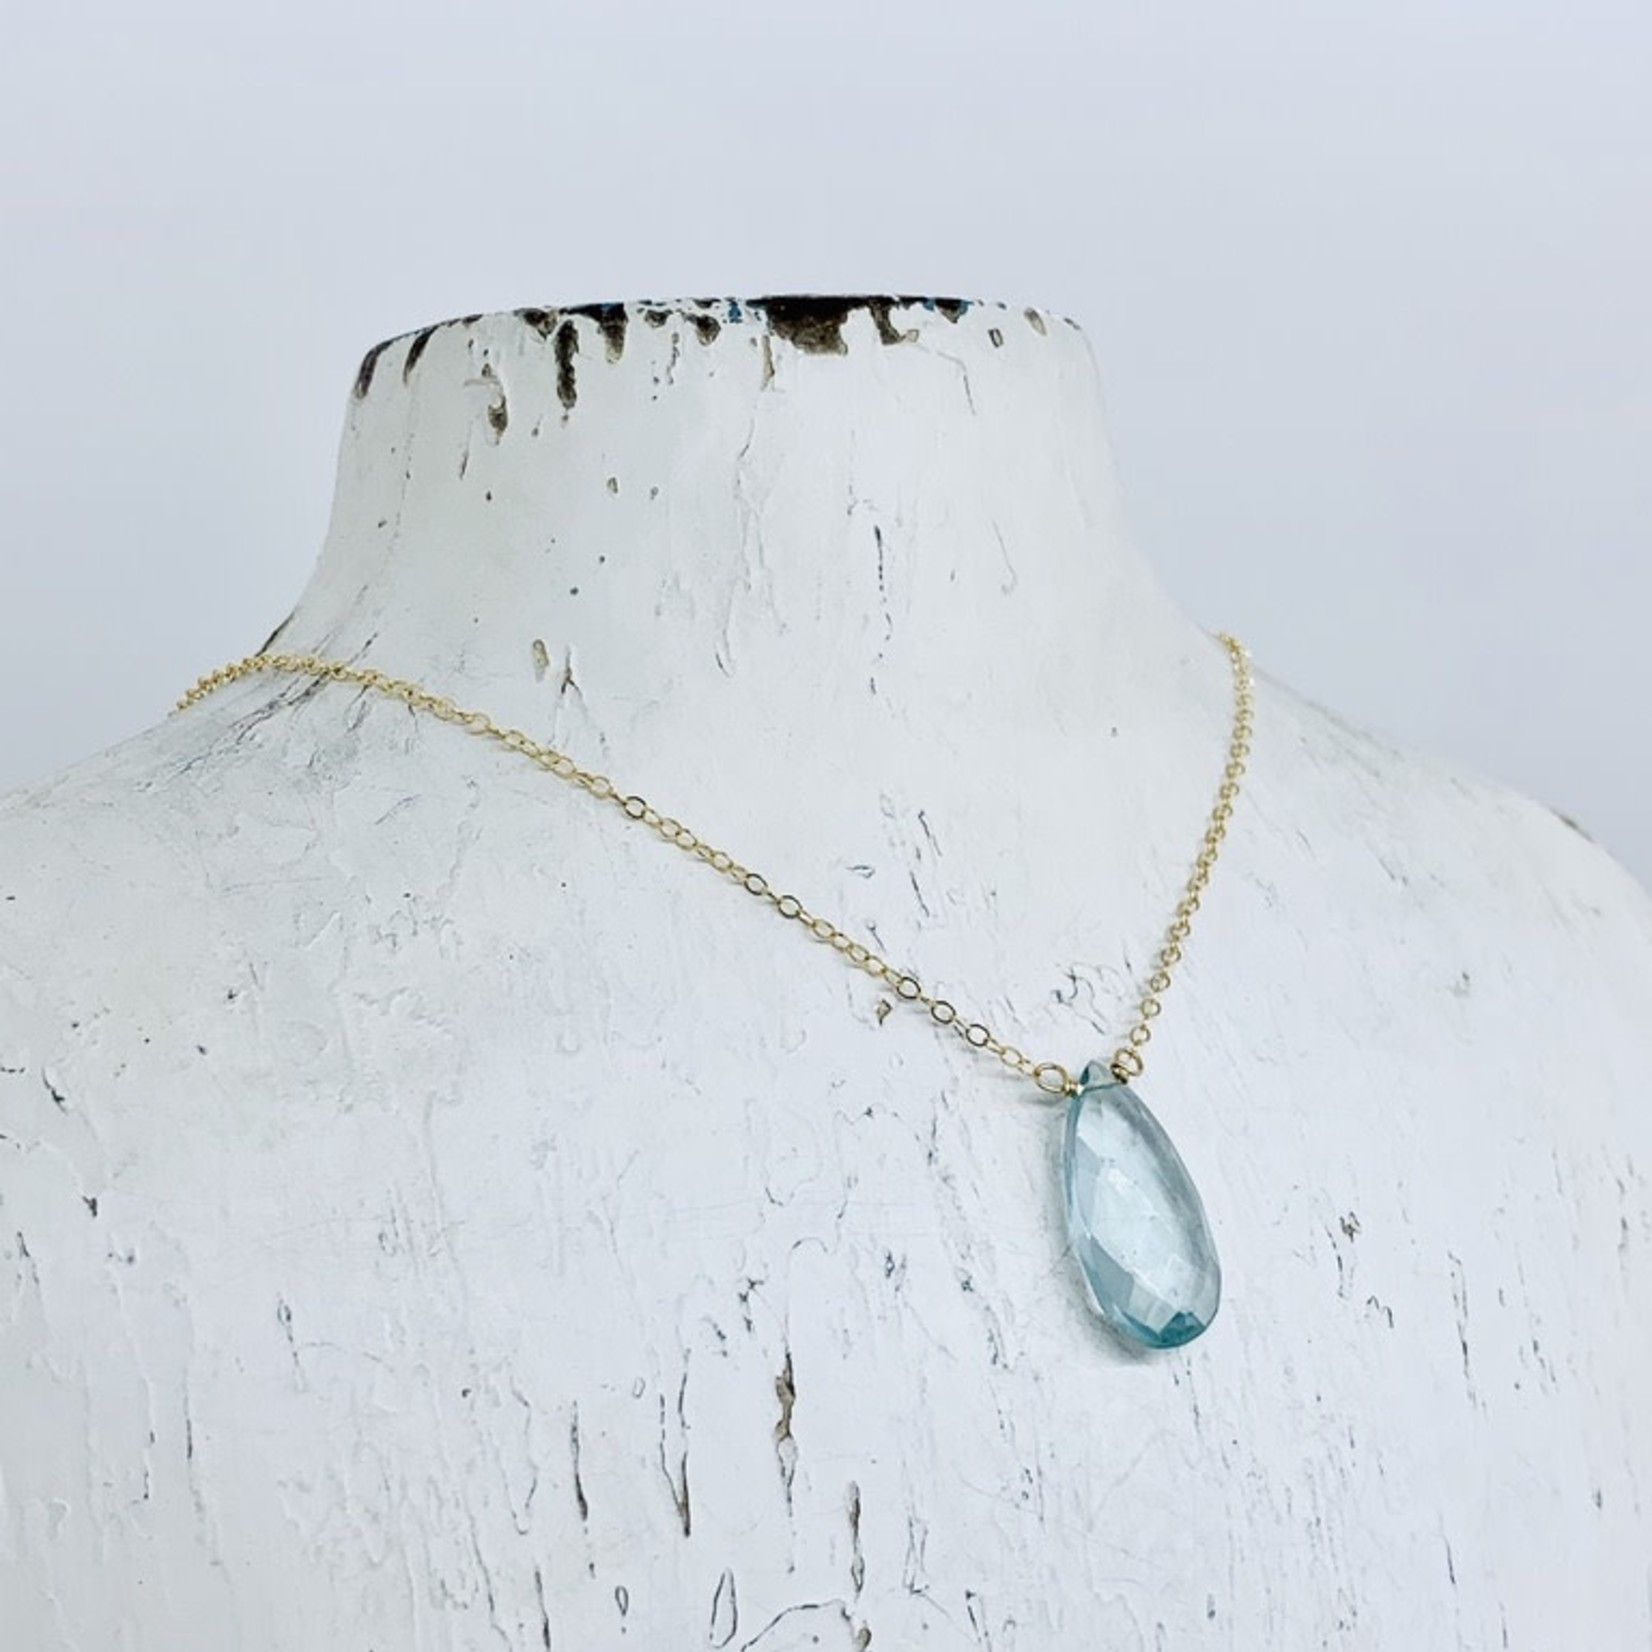 Locally Handmade Simple Gemstone Necklace 14k Goldfill Moss Aquamarine